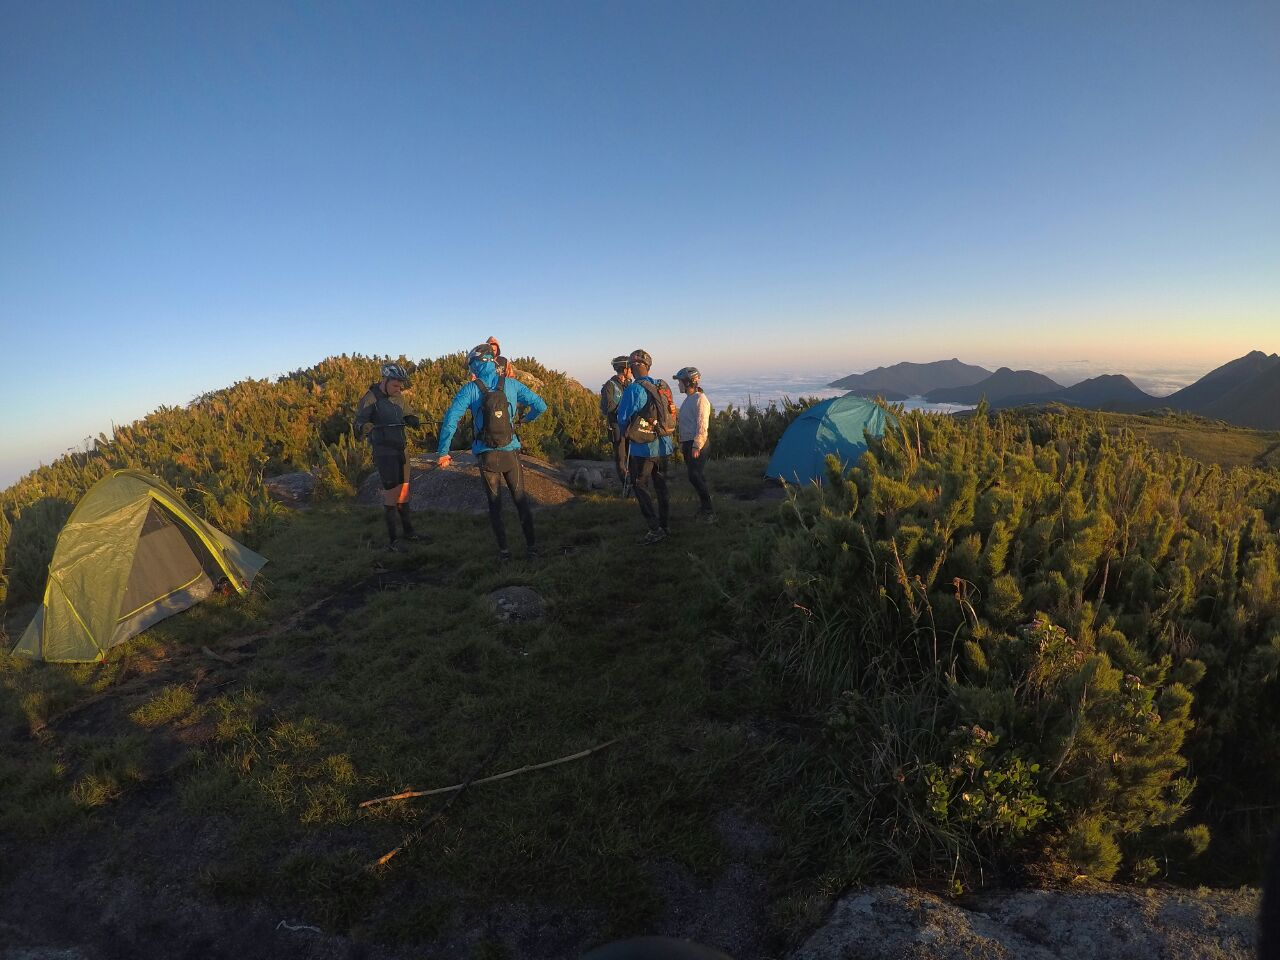 Mundial de corrida de aventura terá equipe do Paraná